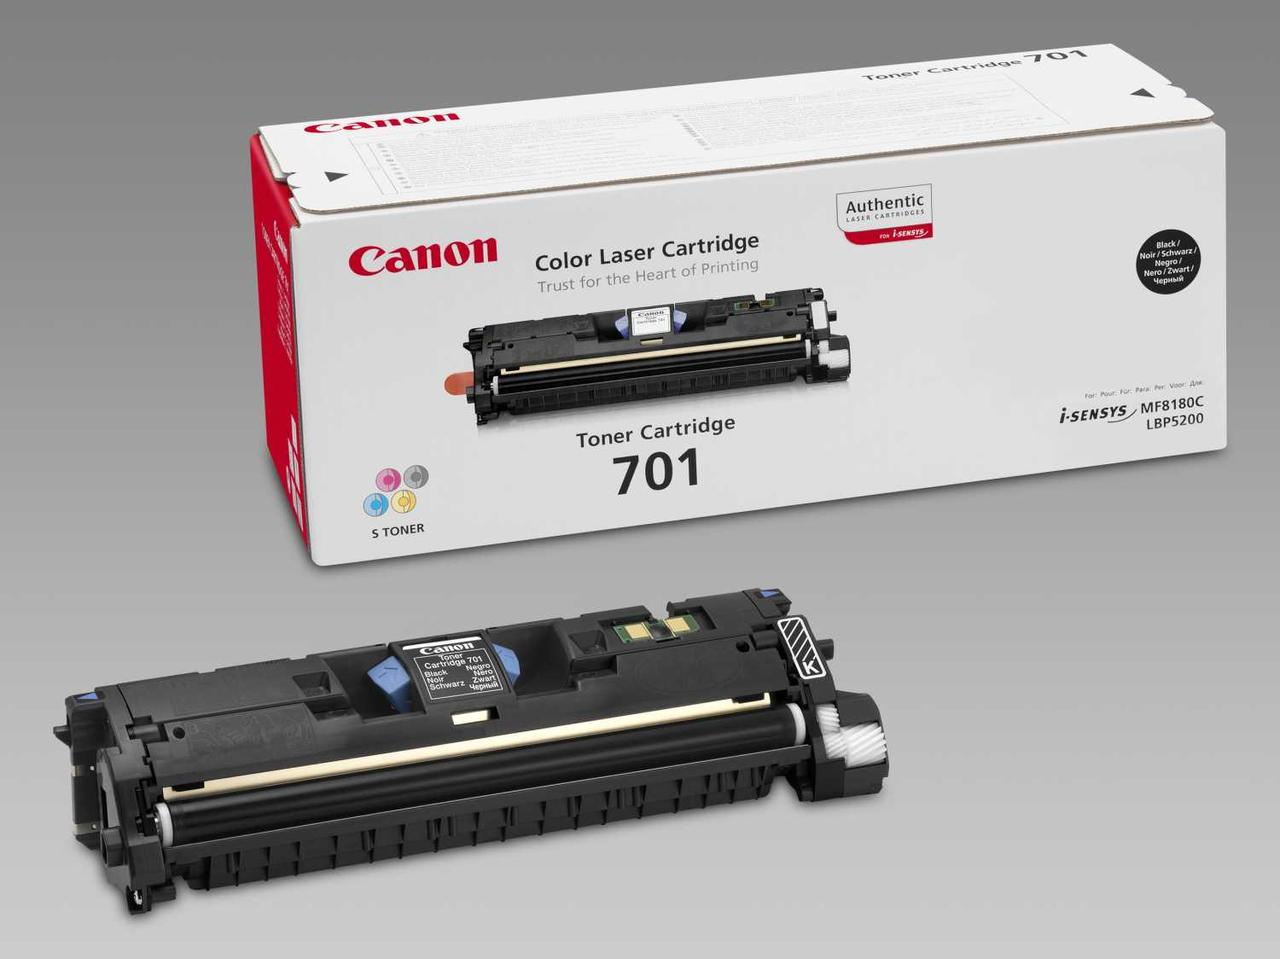 Тонер Canon CARTRIDGE 701 BLACK/LBP5200